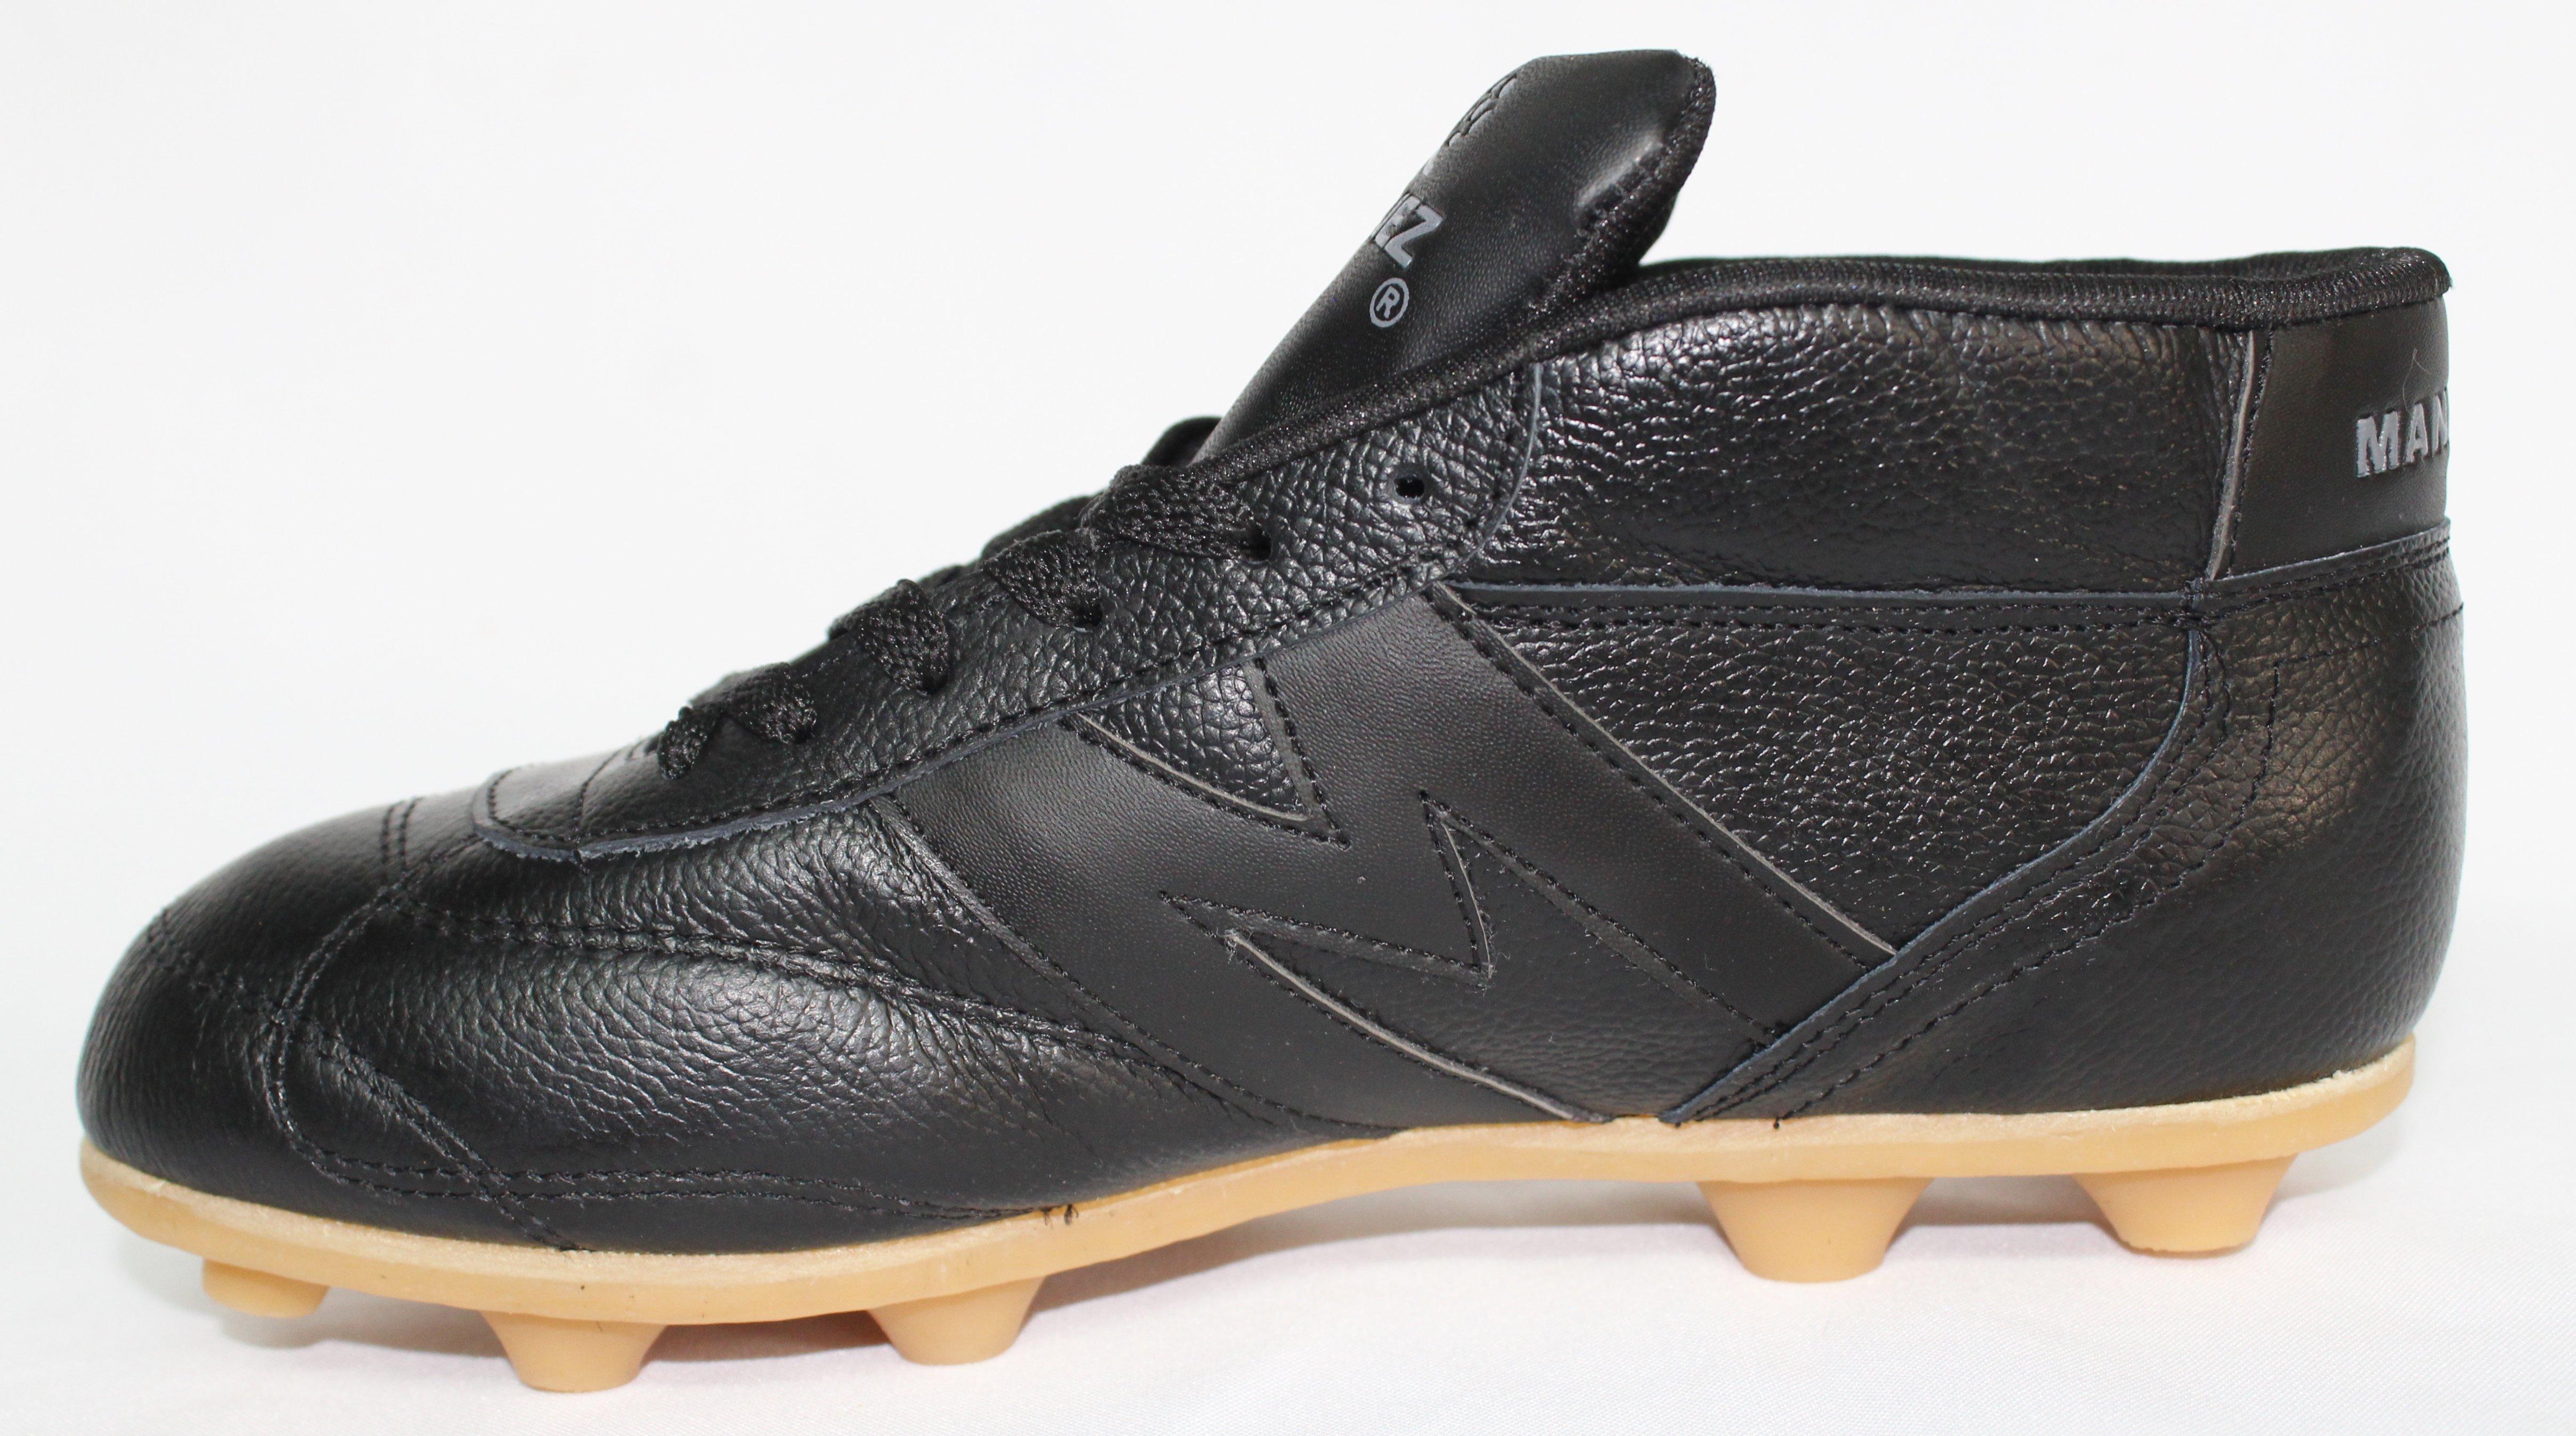 668ff814e 2393-Zapato futbol Manriquez modelo Bota Vintage TX